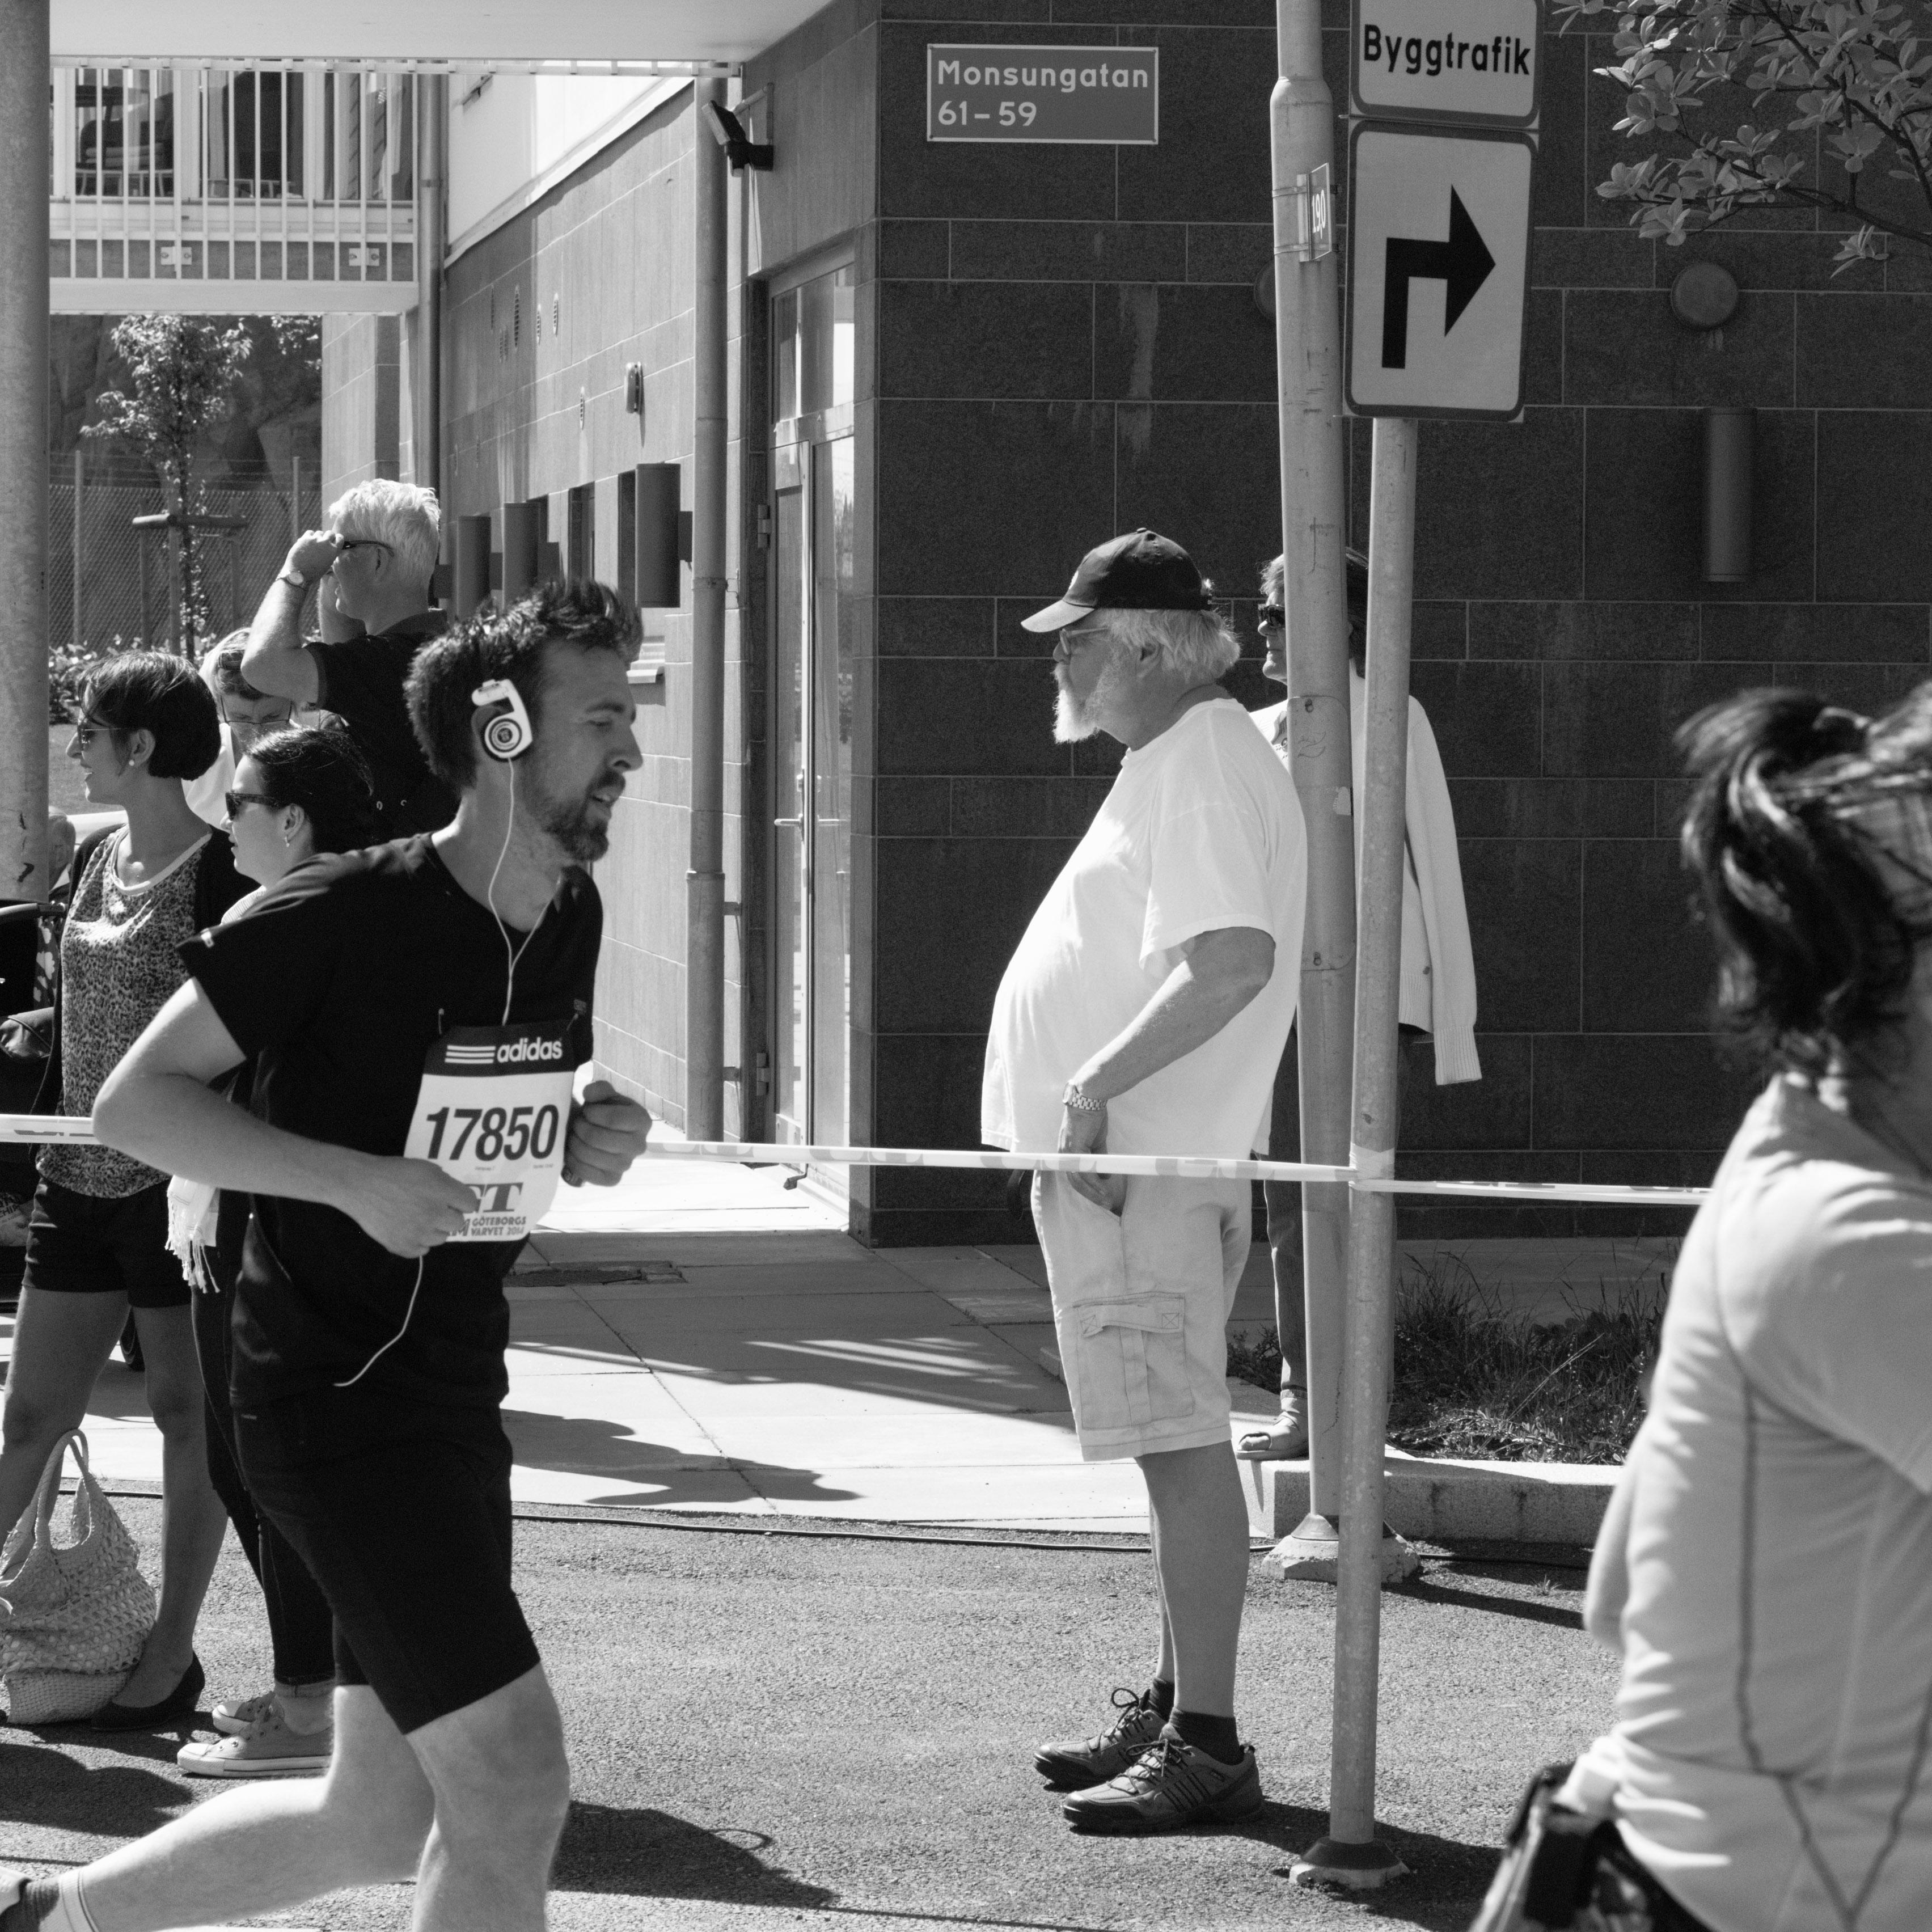 Bystander I at Eriksberg (Gothenburg, Sweden) with Leica M Monochrom (Leica Macro-Elmar-M 90mm f/4) by Magnus L Andersson (photography.anderssoneklund.se) at 2014-05-17 13:18:31